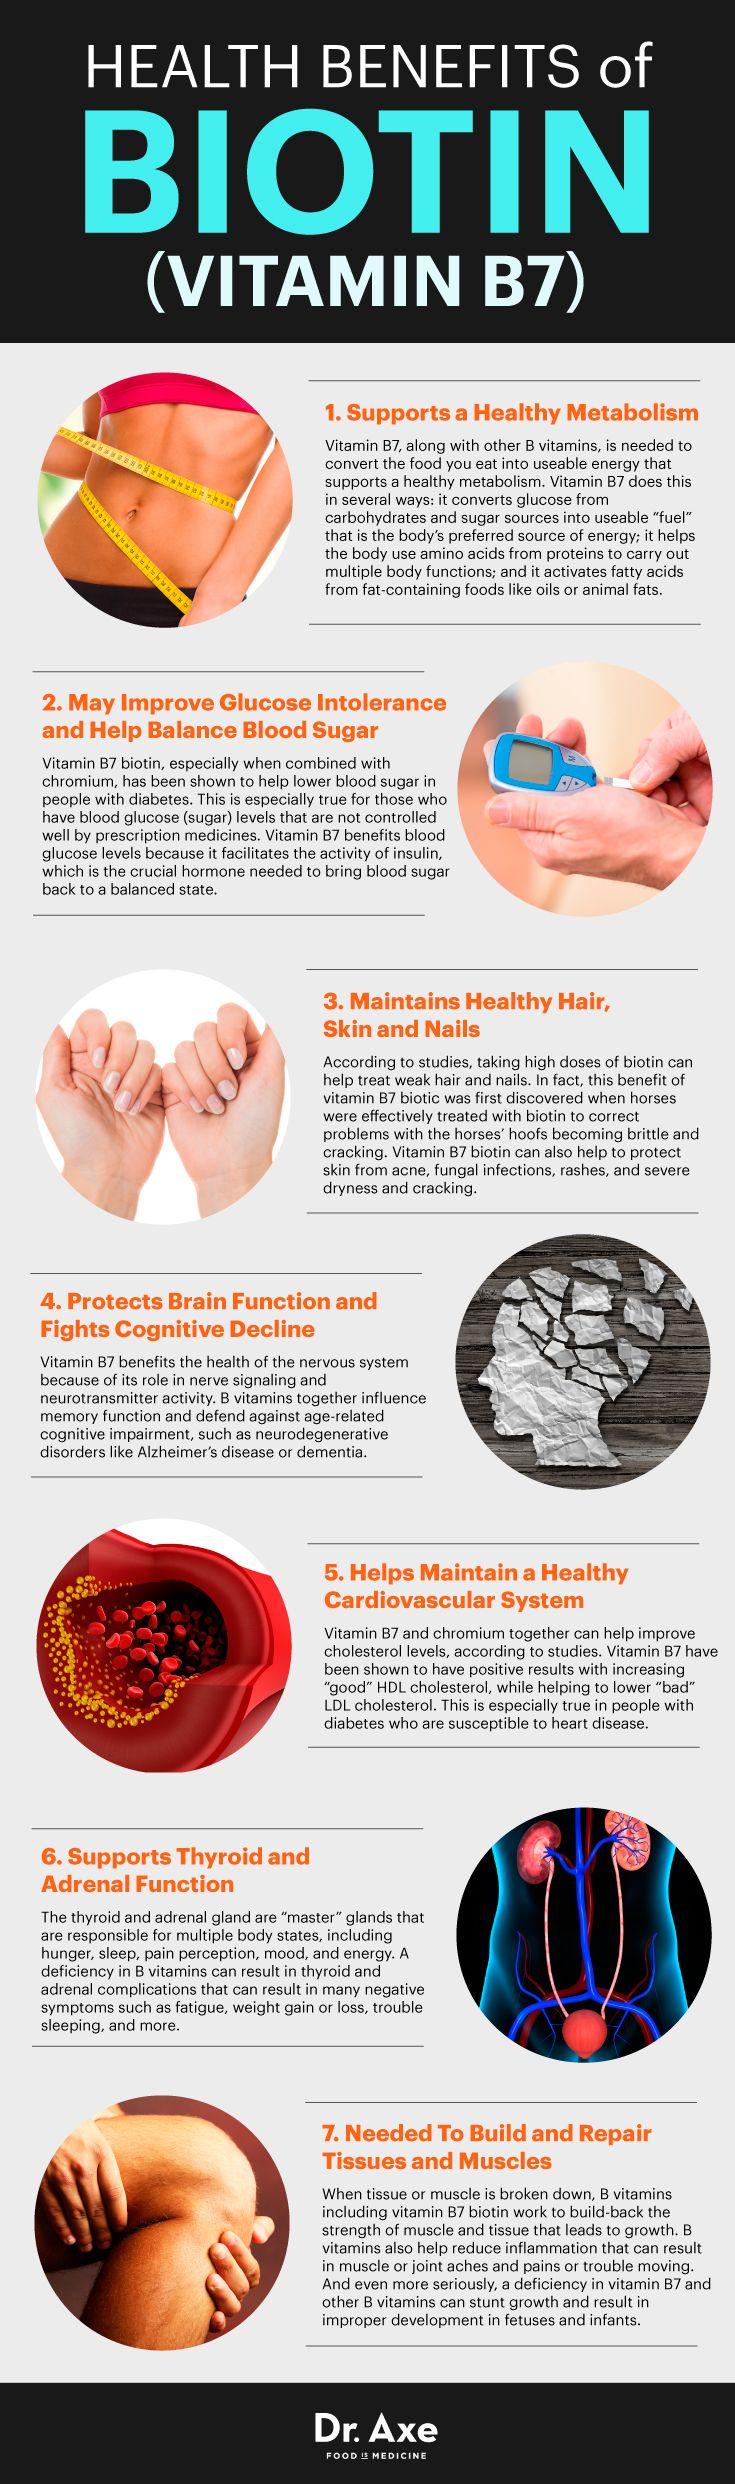 Biotin (vitamin B7) benefits